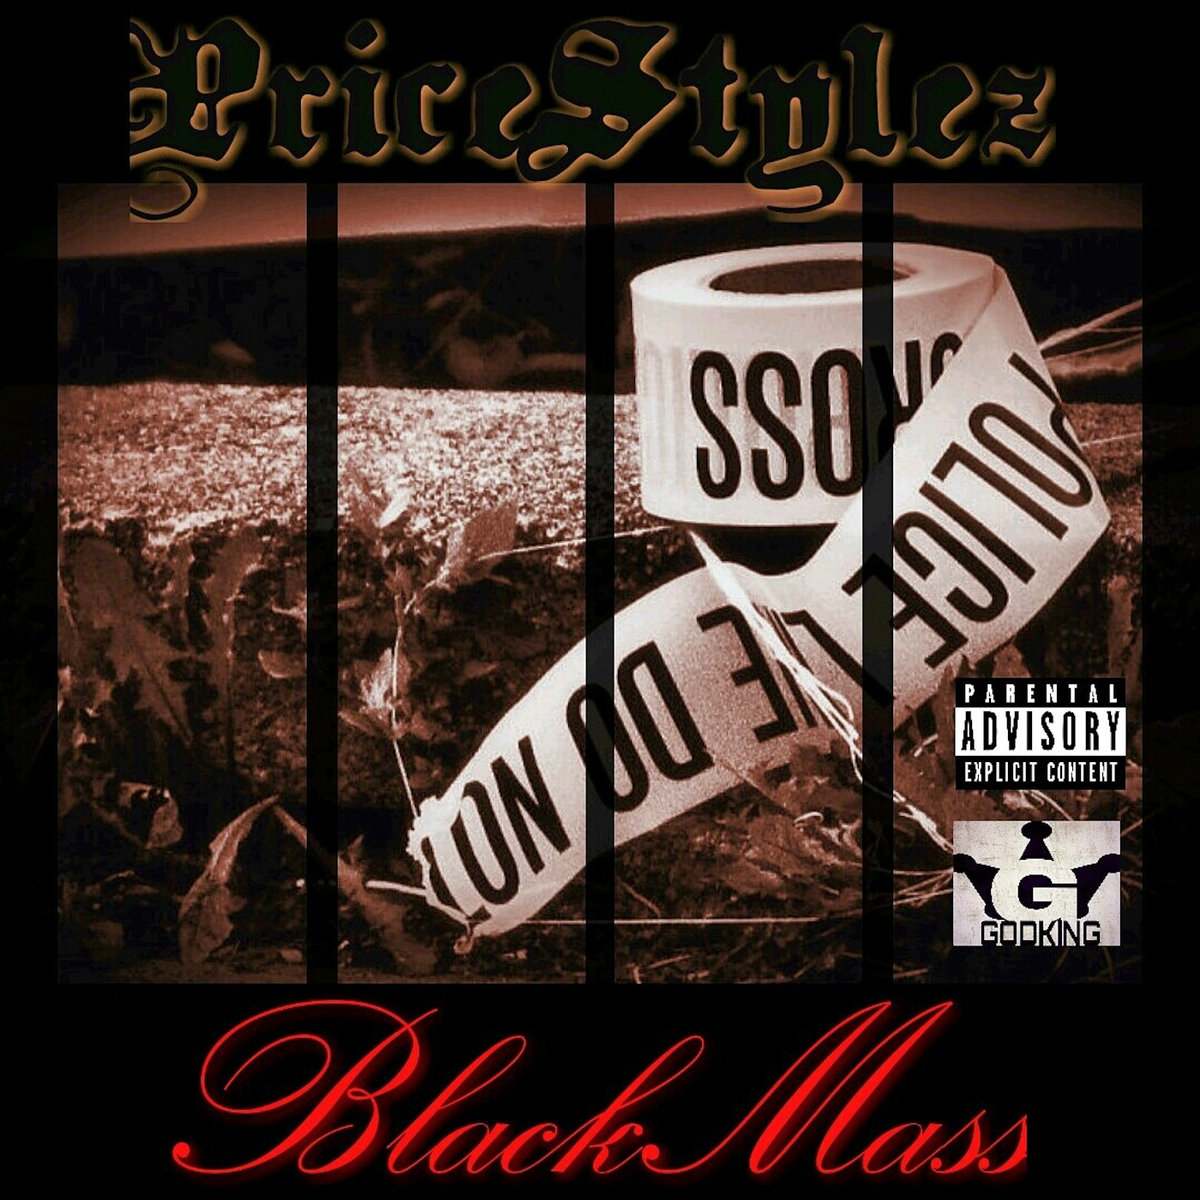 Black Mass EP | Price Stylez